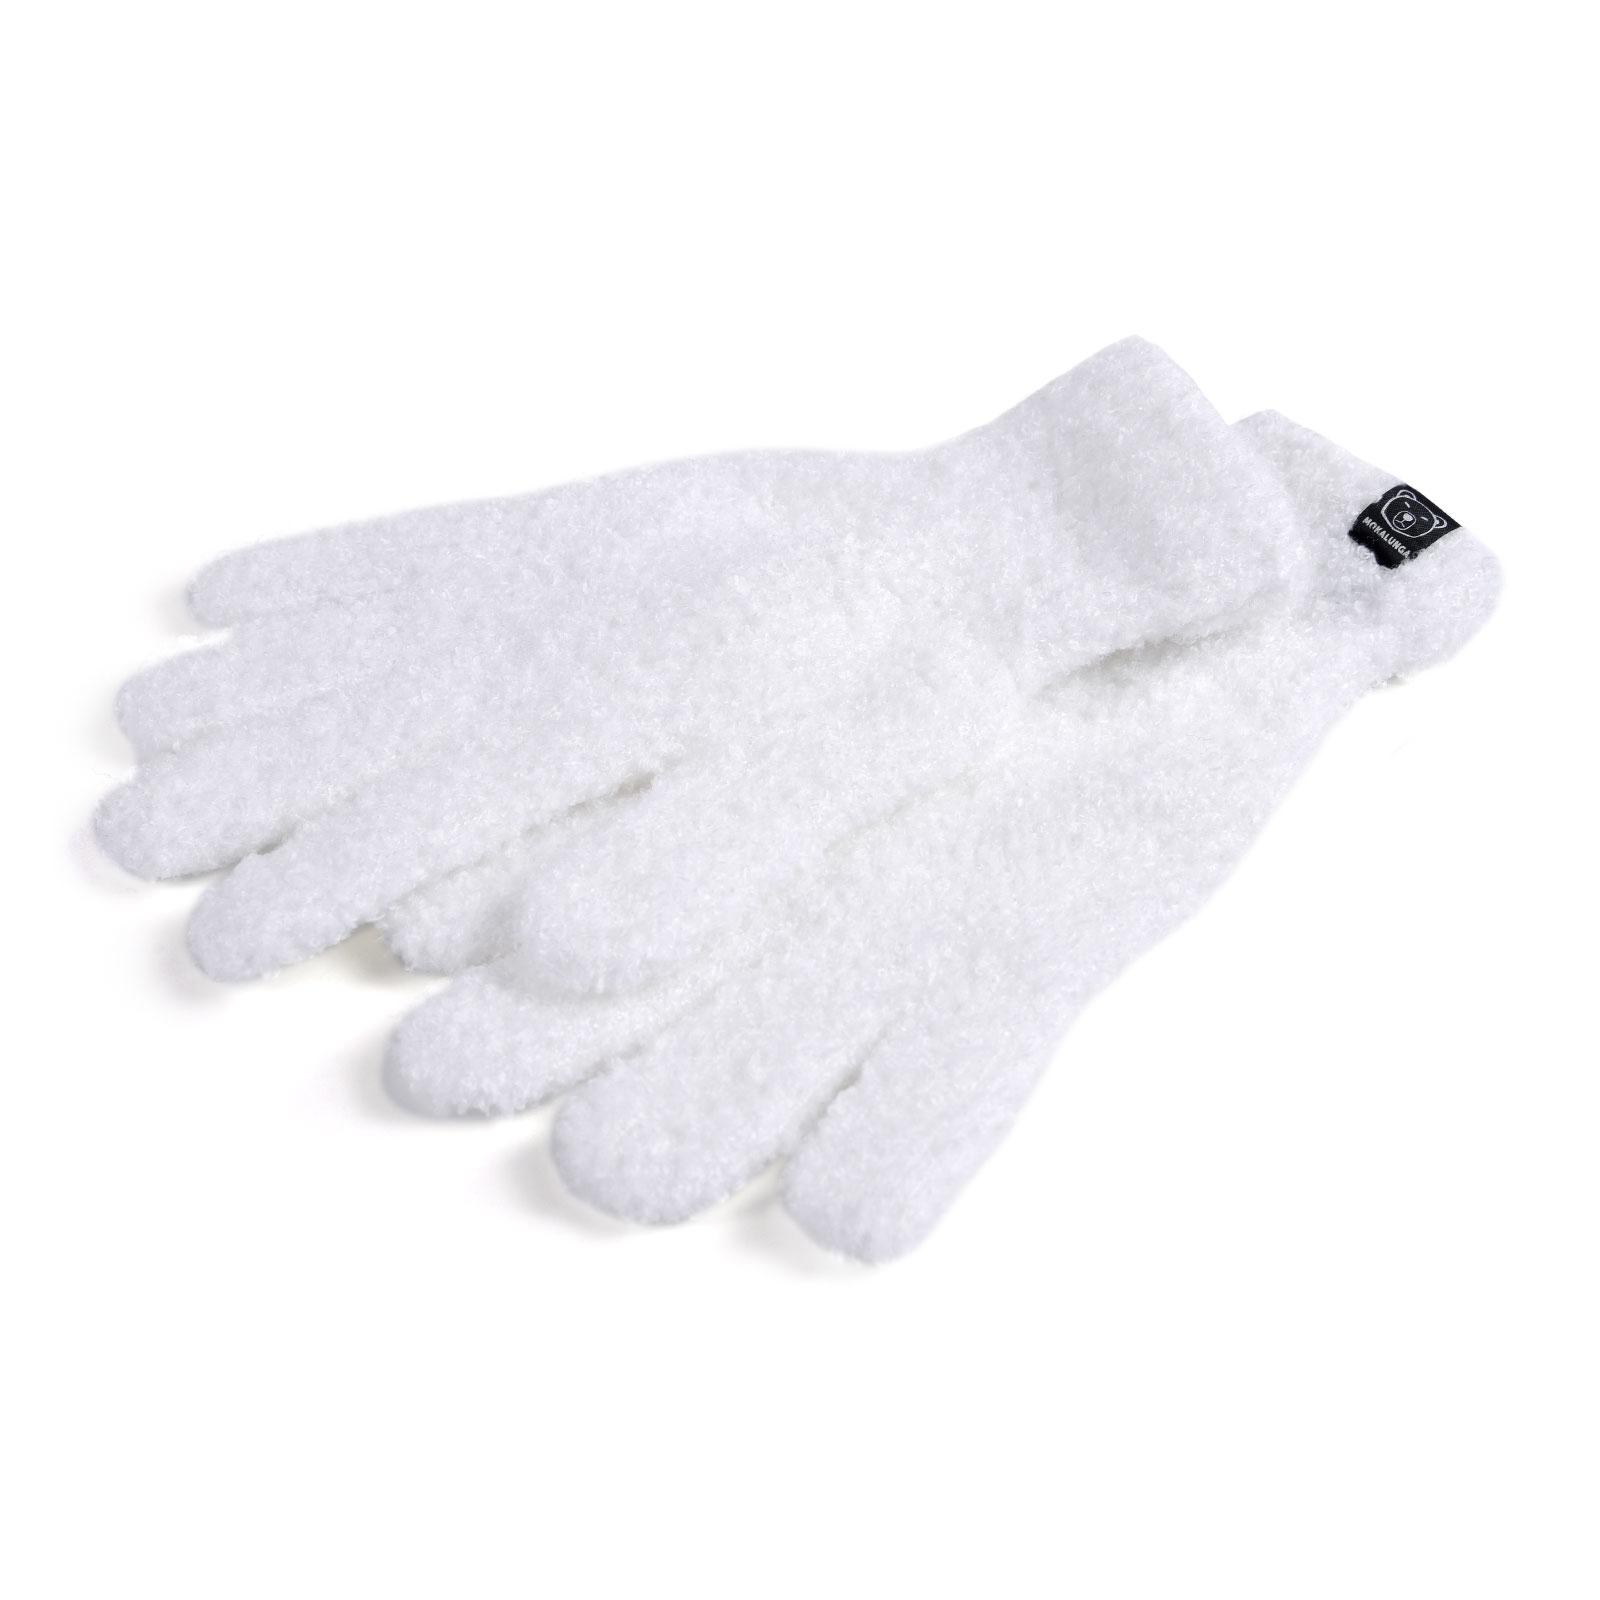 GA-00019-F16-P-gants femme-bouclettes-blancs